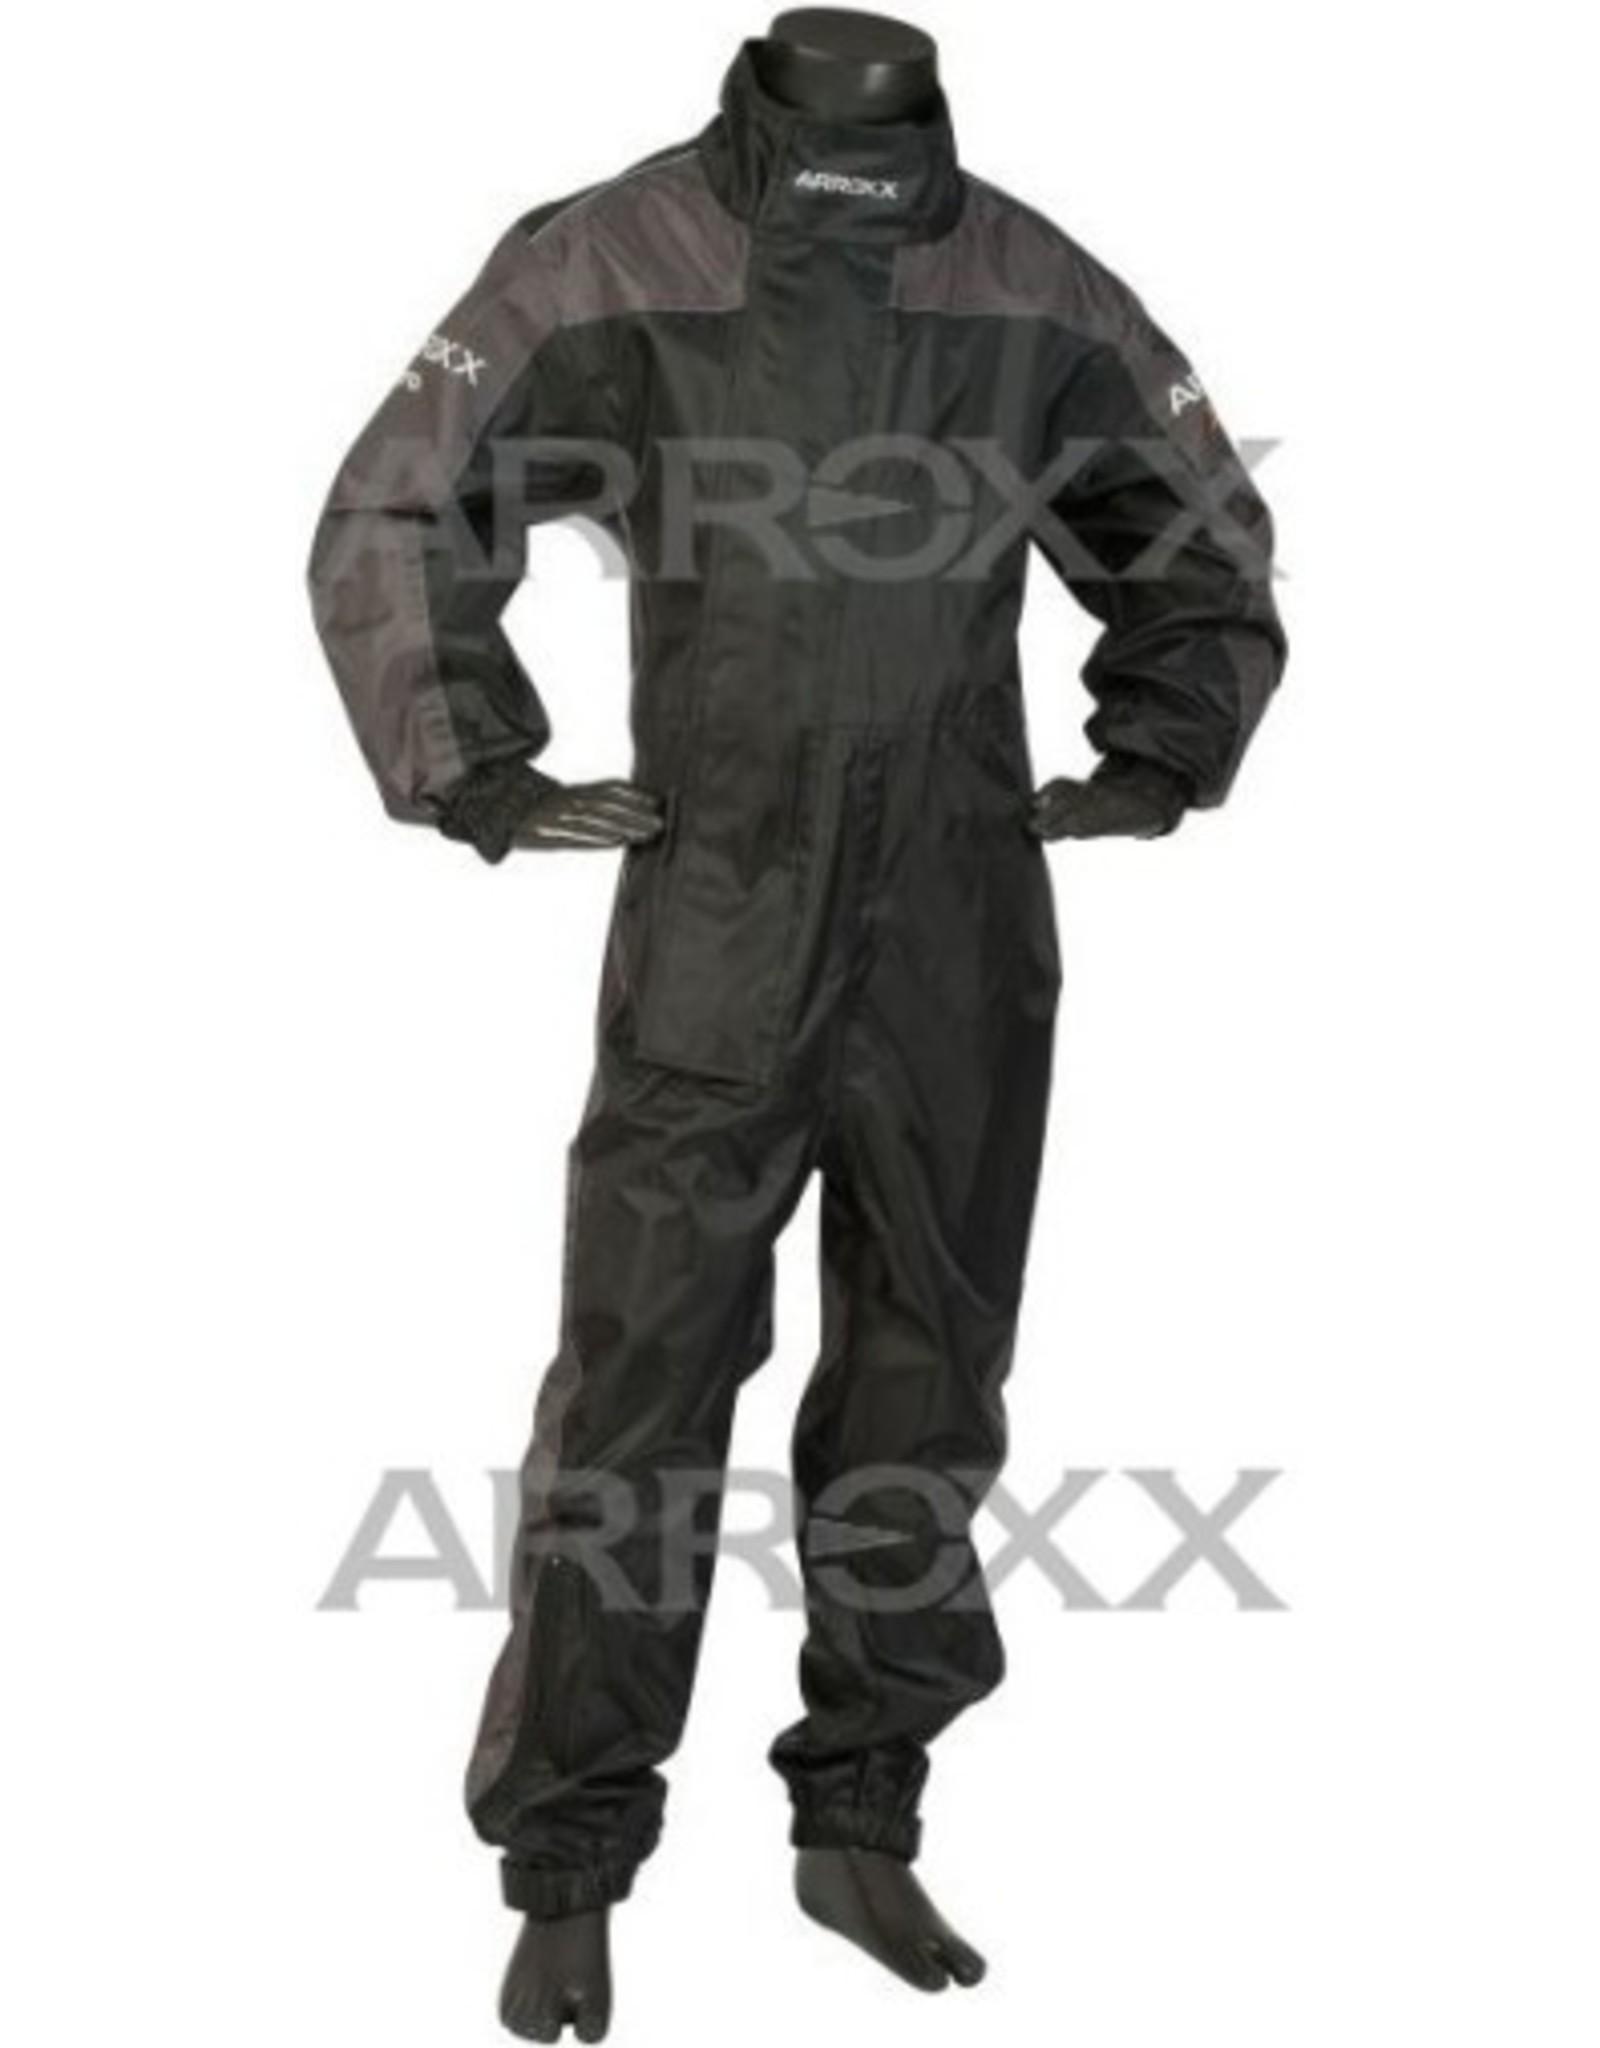 Arroxx Arroxx regenoverall Xpro Zwart / grijs